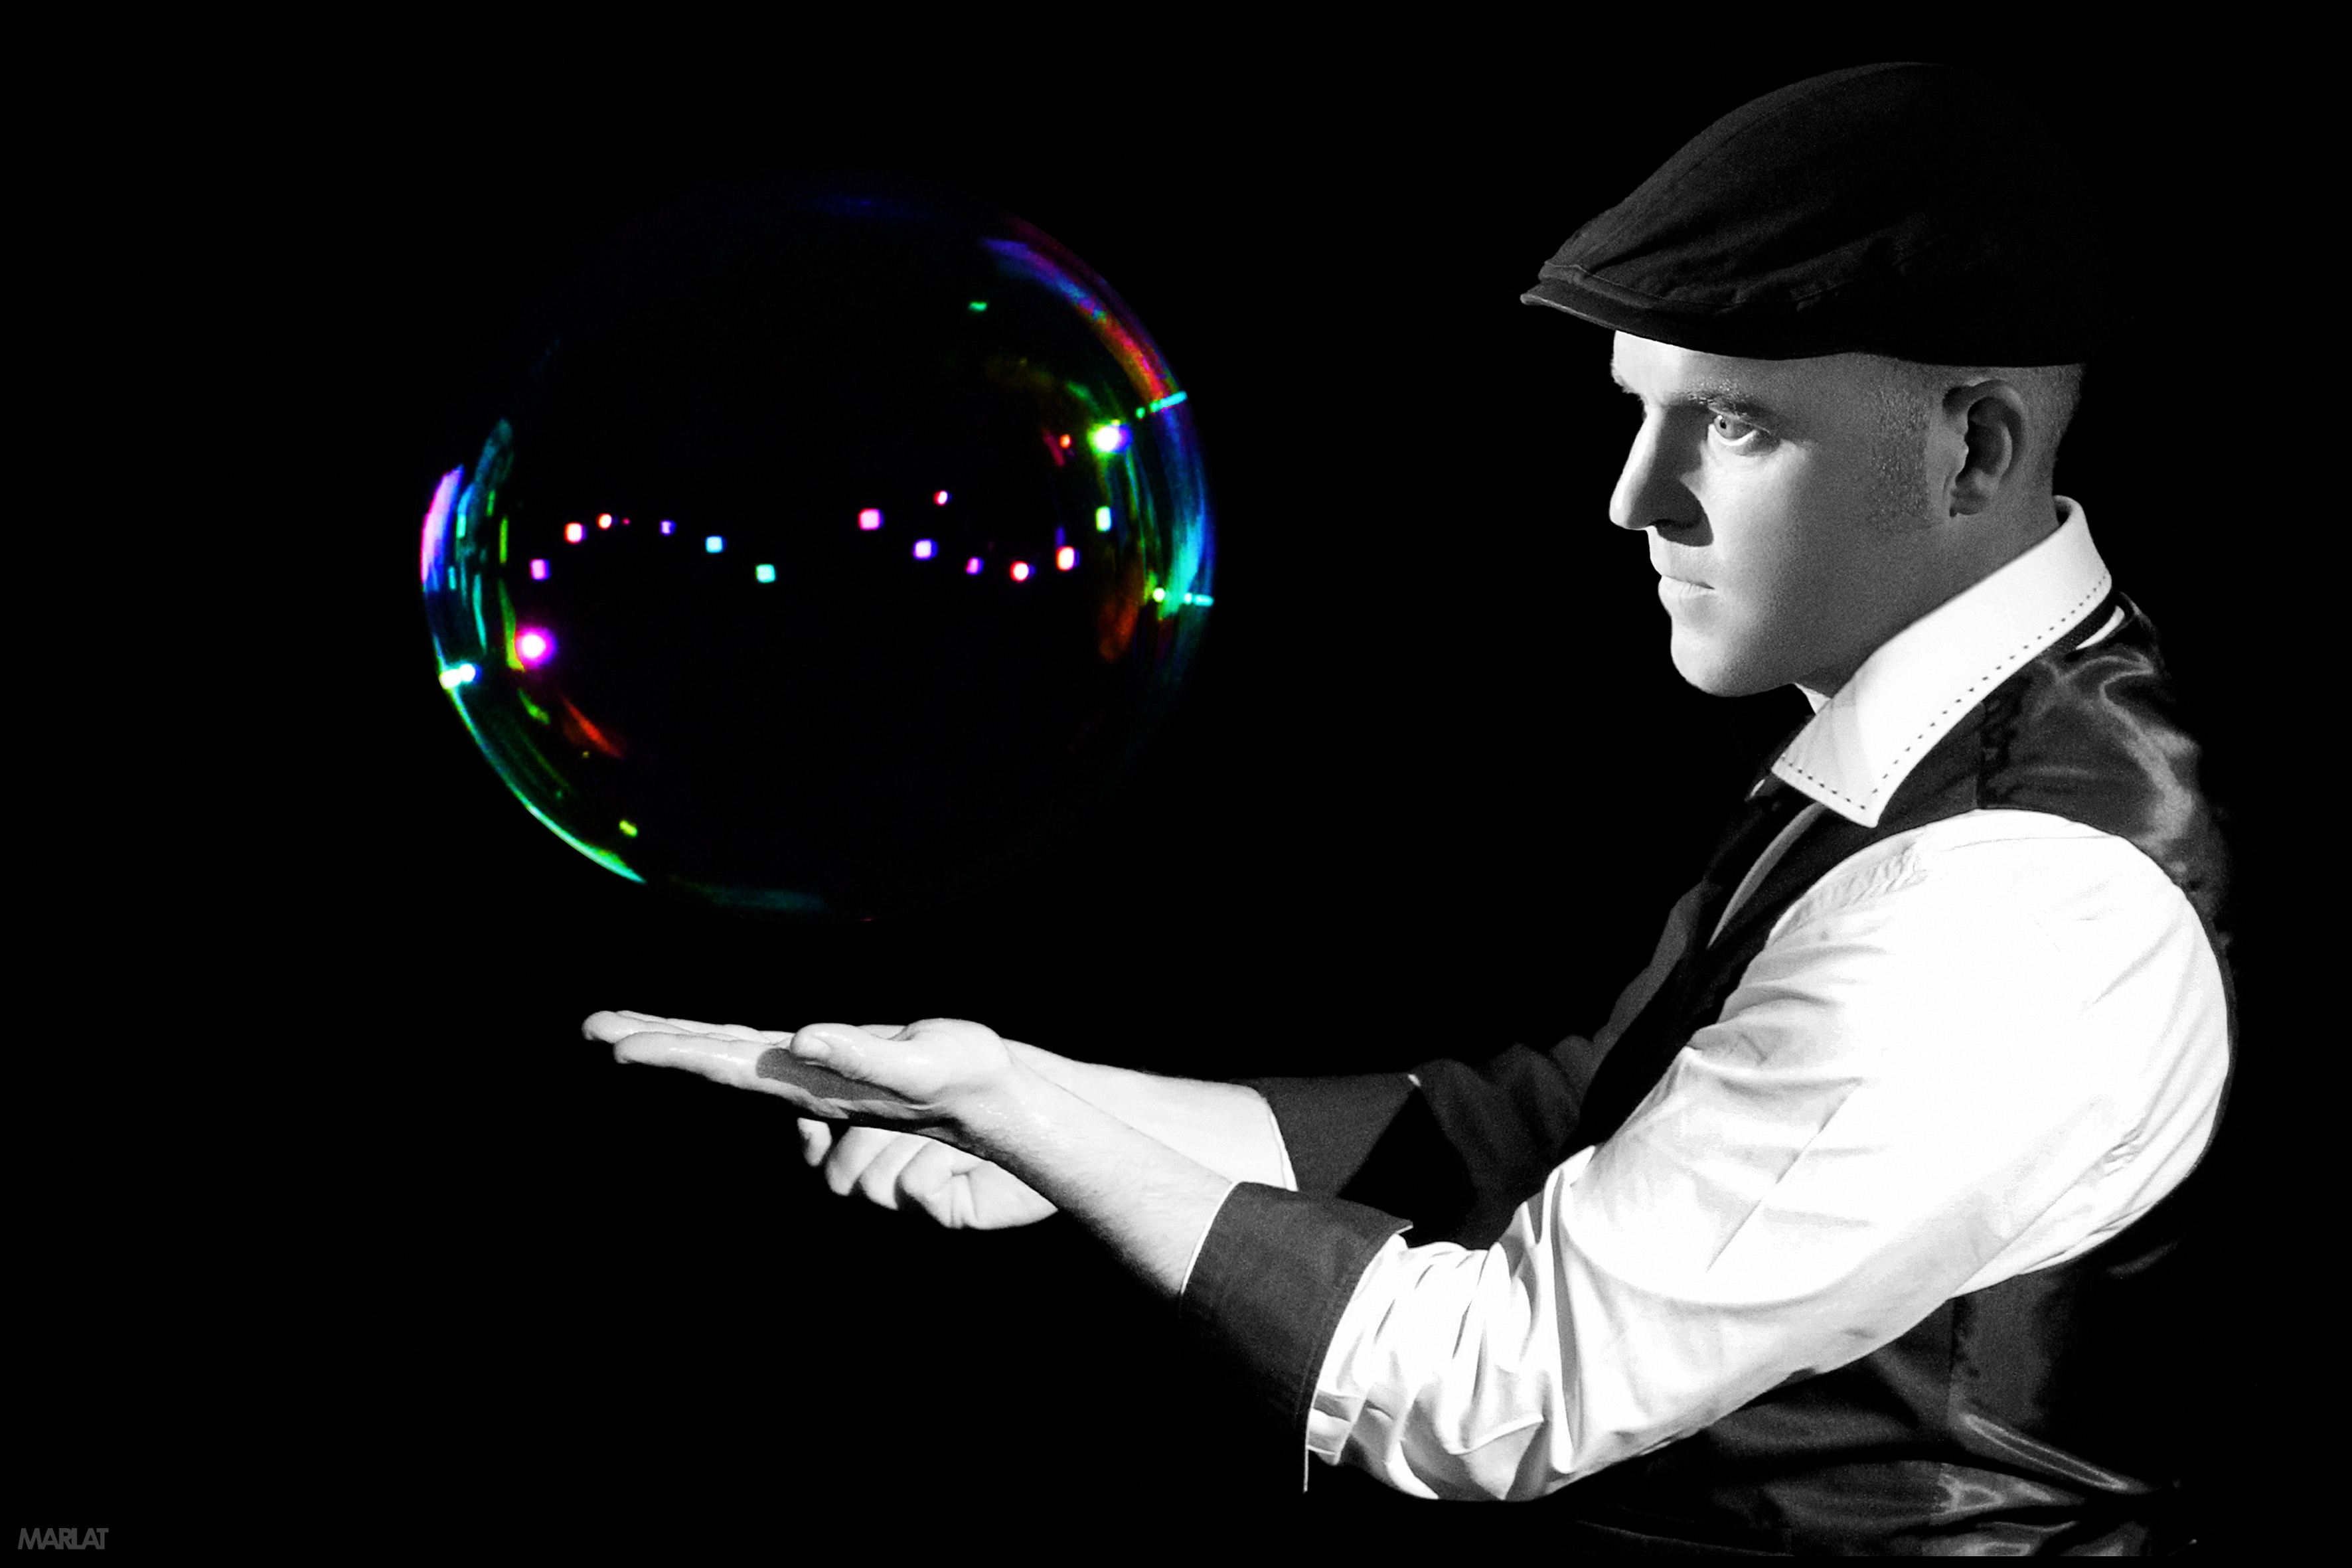 Faiseur de bulles, Thibault Marlat